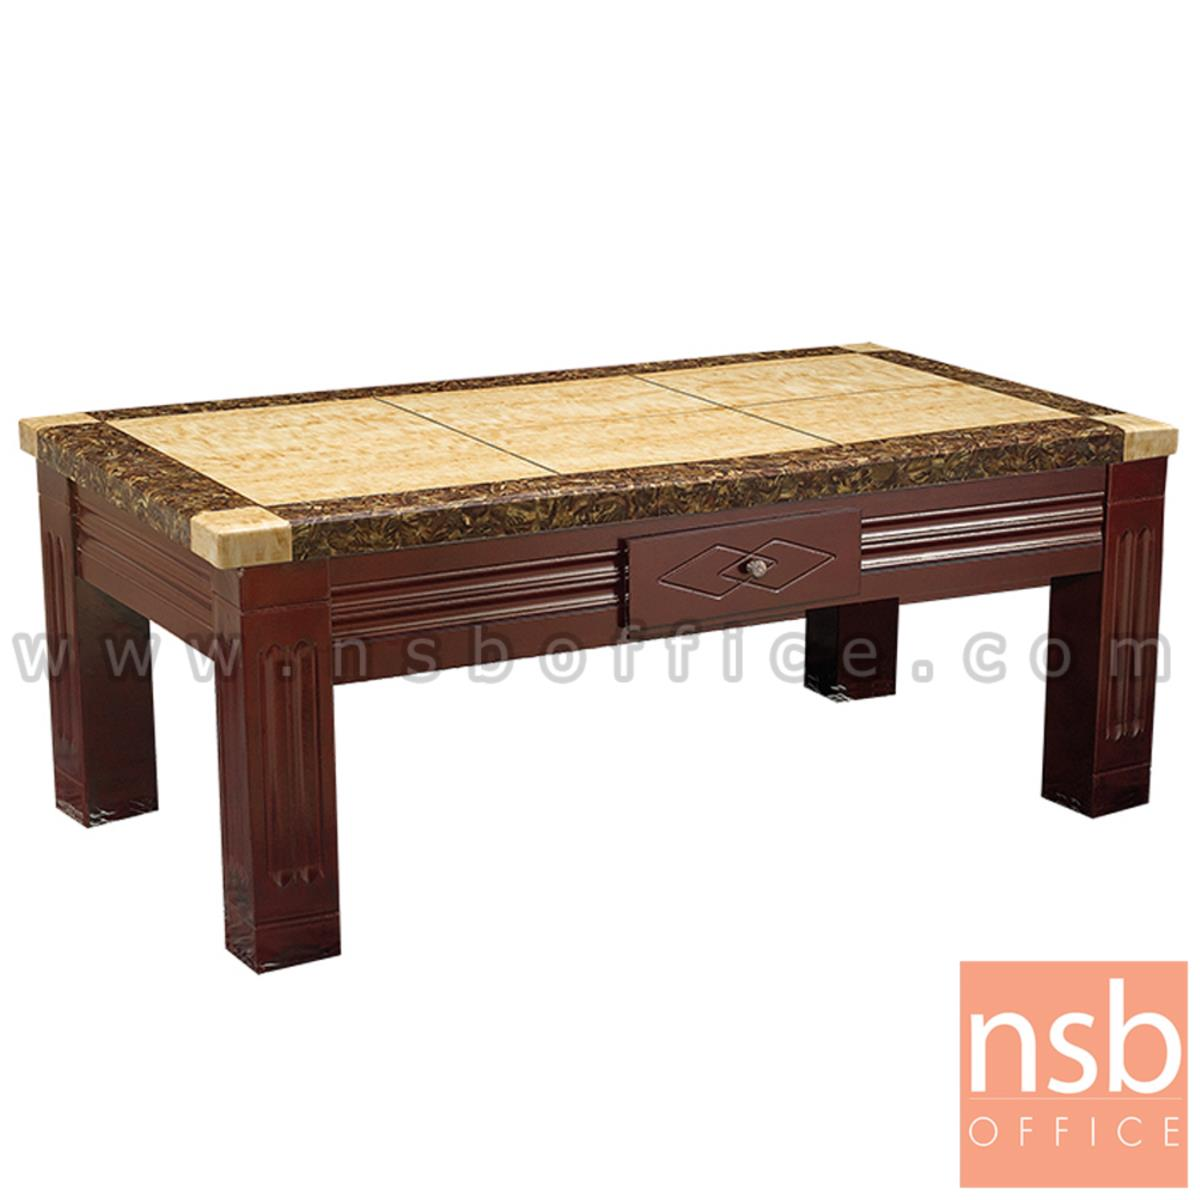 B13A209:โต๊ะกลางหินอ่อน  รุ่น MSTL-920 ขนาด 120W cm. ขาไม้